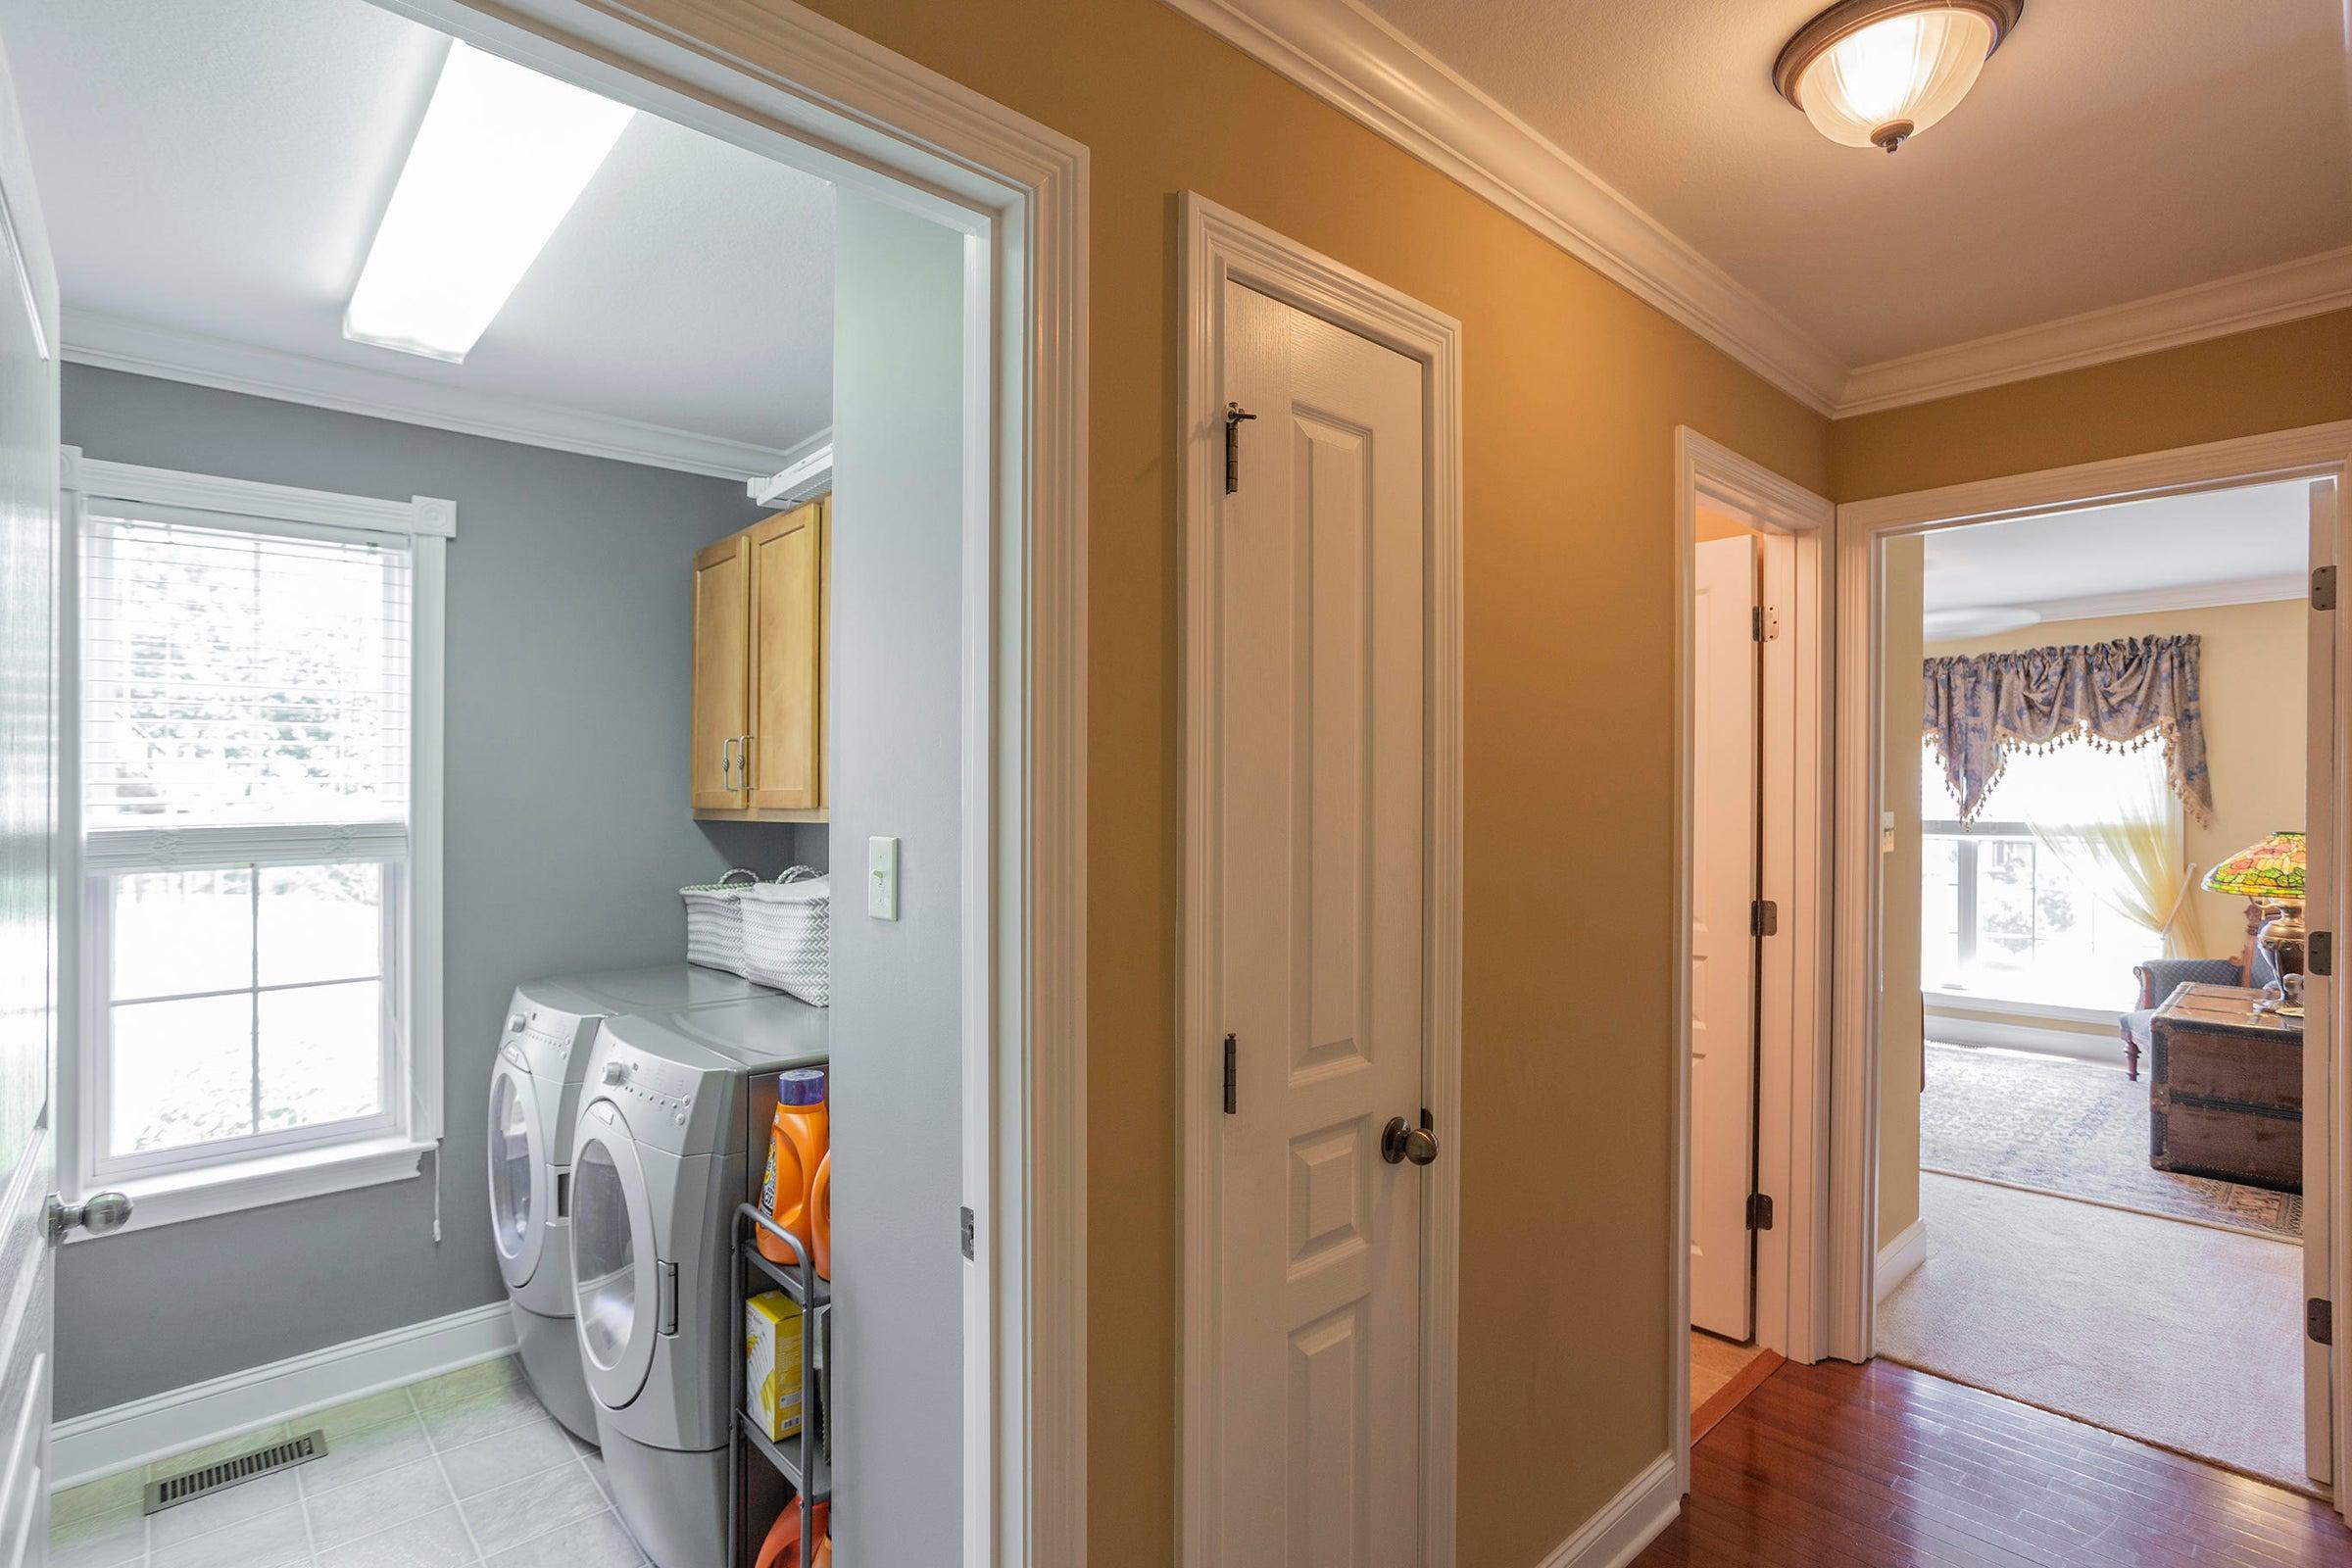 Interior_Main-Flr-Hallway-01